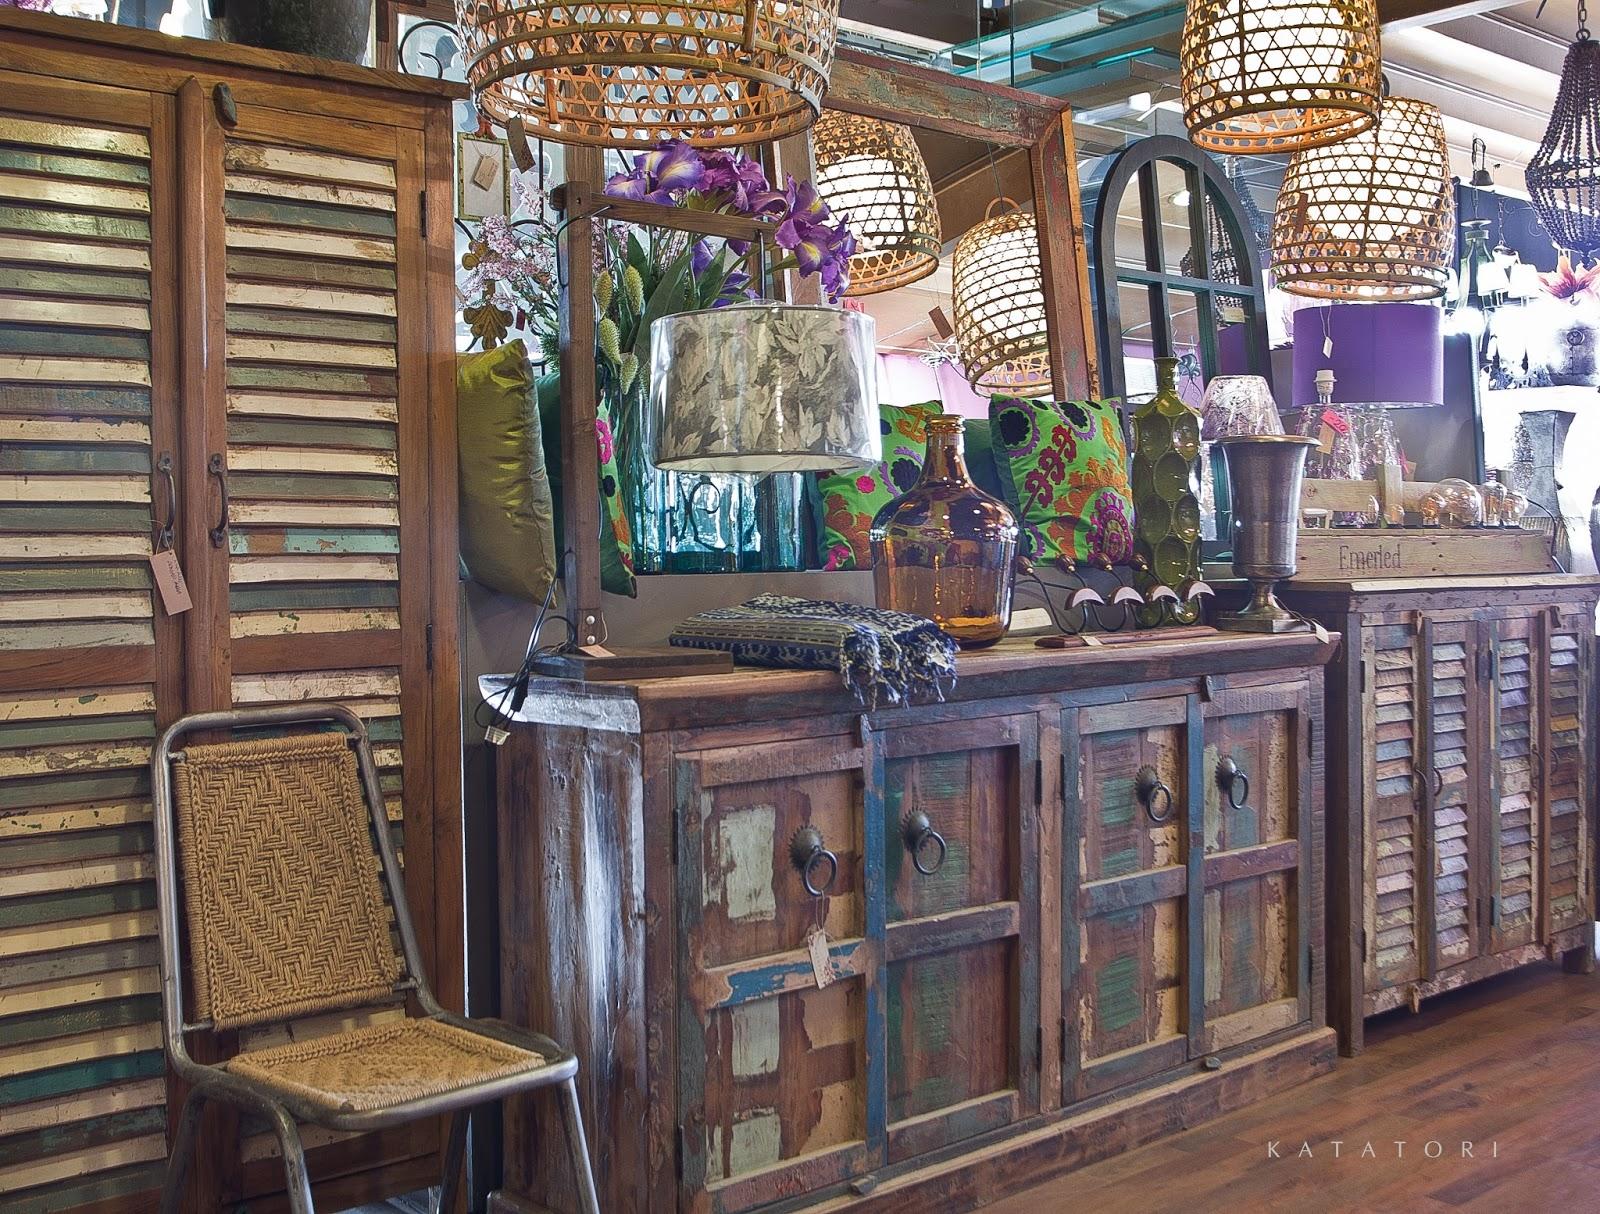 Katatori interiores colores de oto o for Muebles poligono el manchon